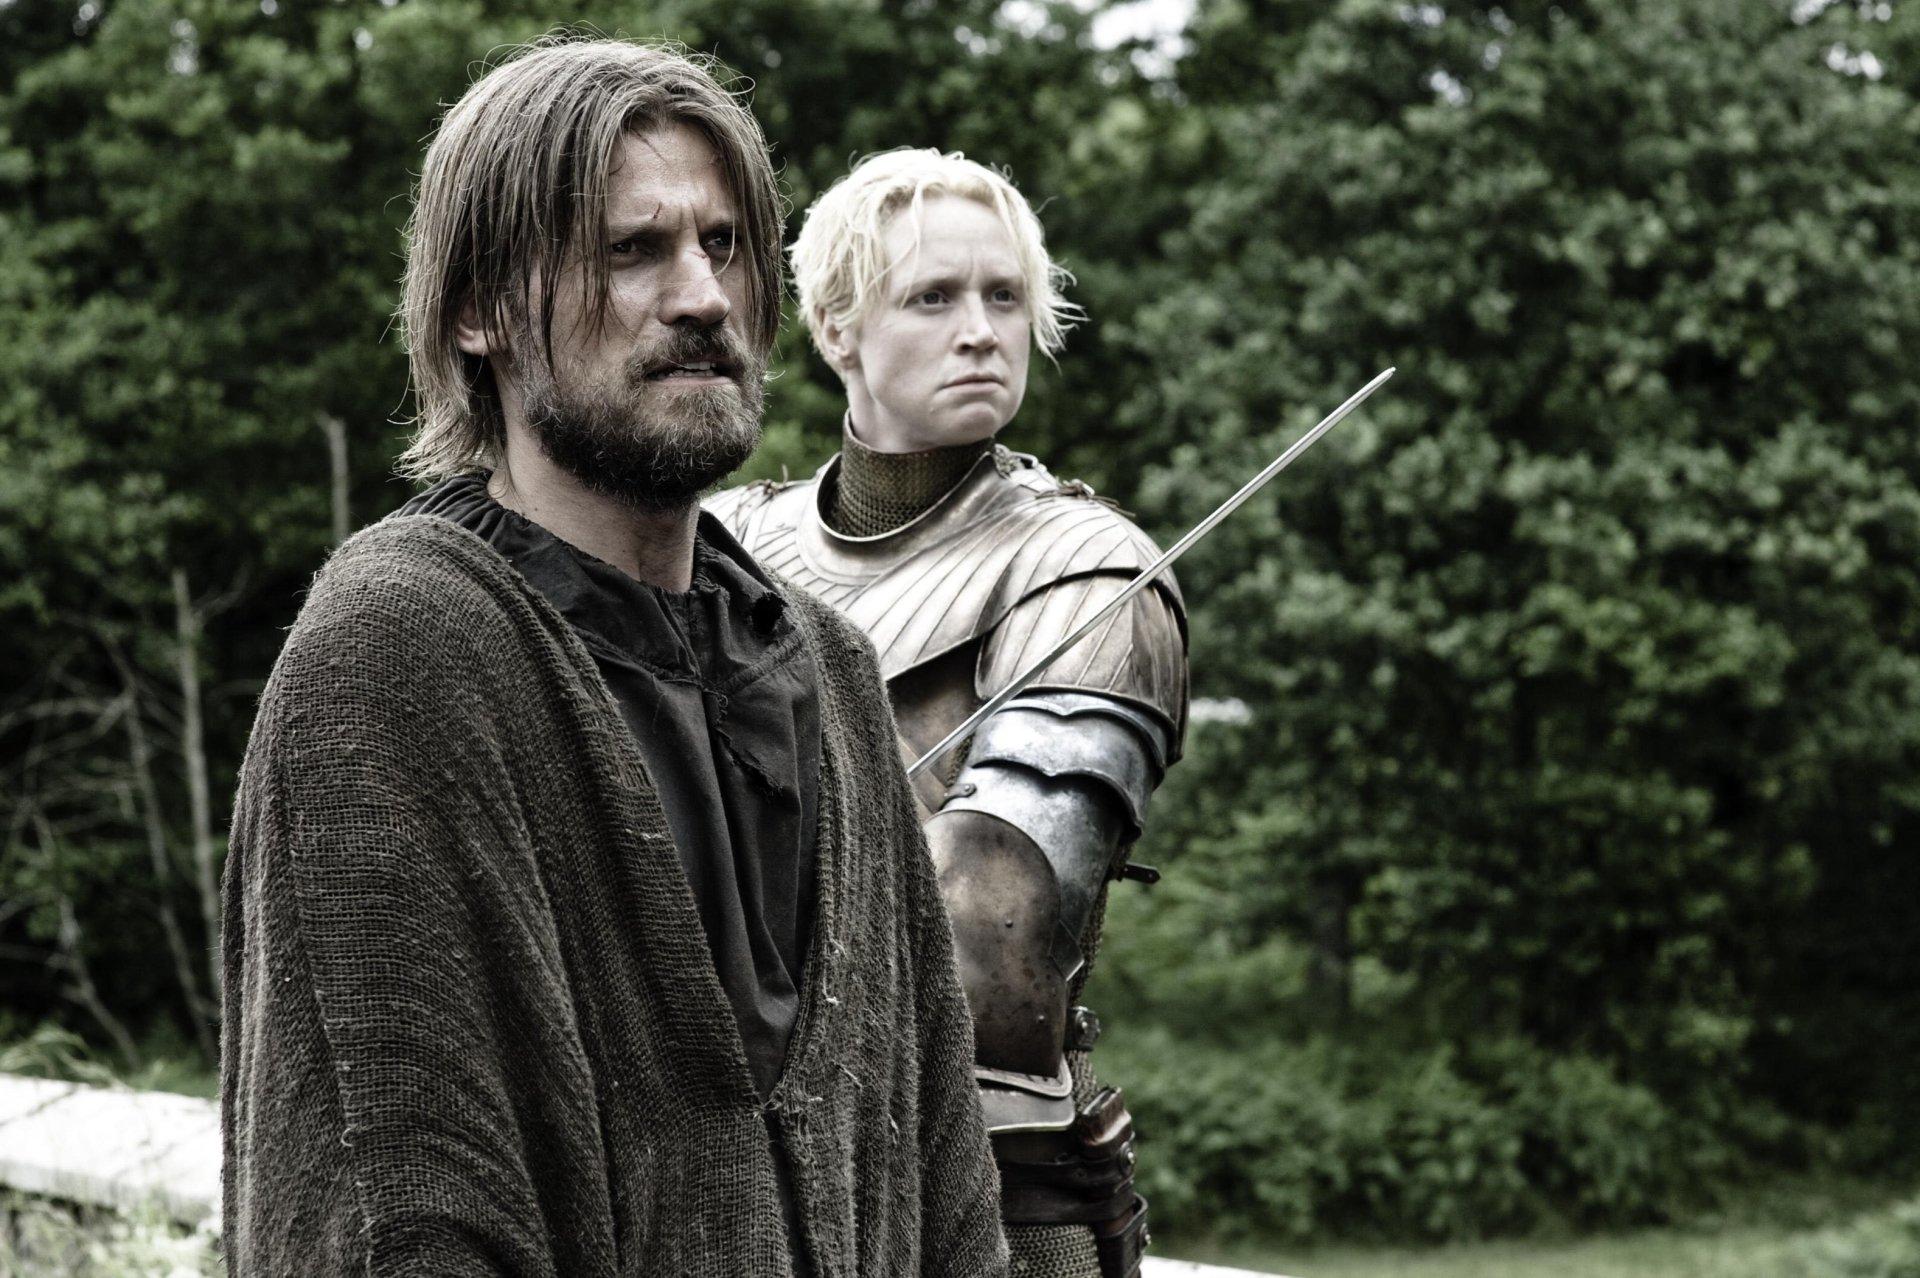 电视剧 - 权力的游戏  Jaime Lannister Brienne Of Tarth Nikolaj Coster-Waldau Gwendoline Christie 壁纸